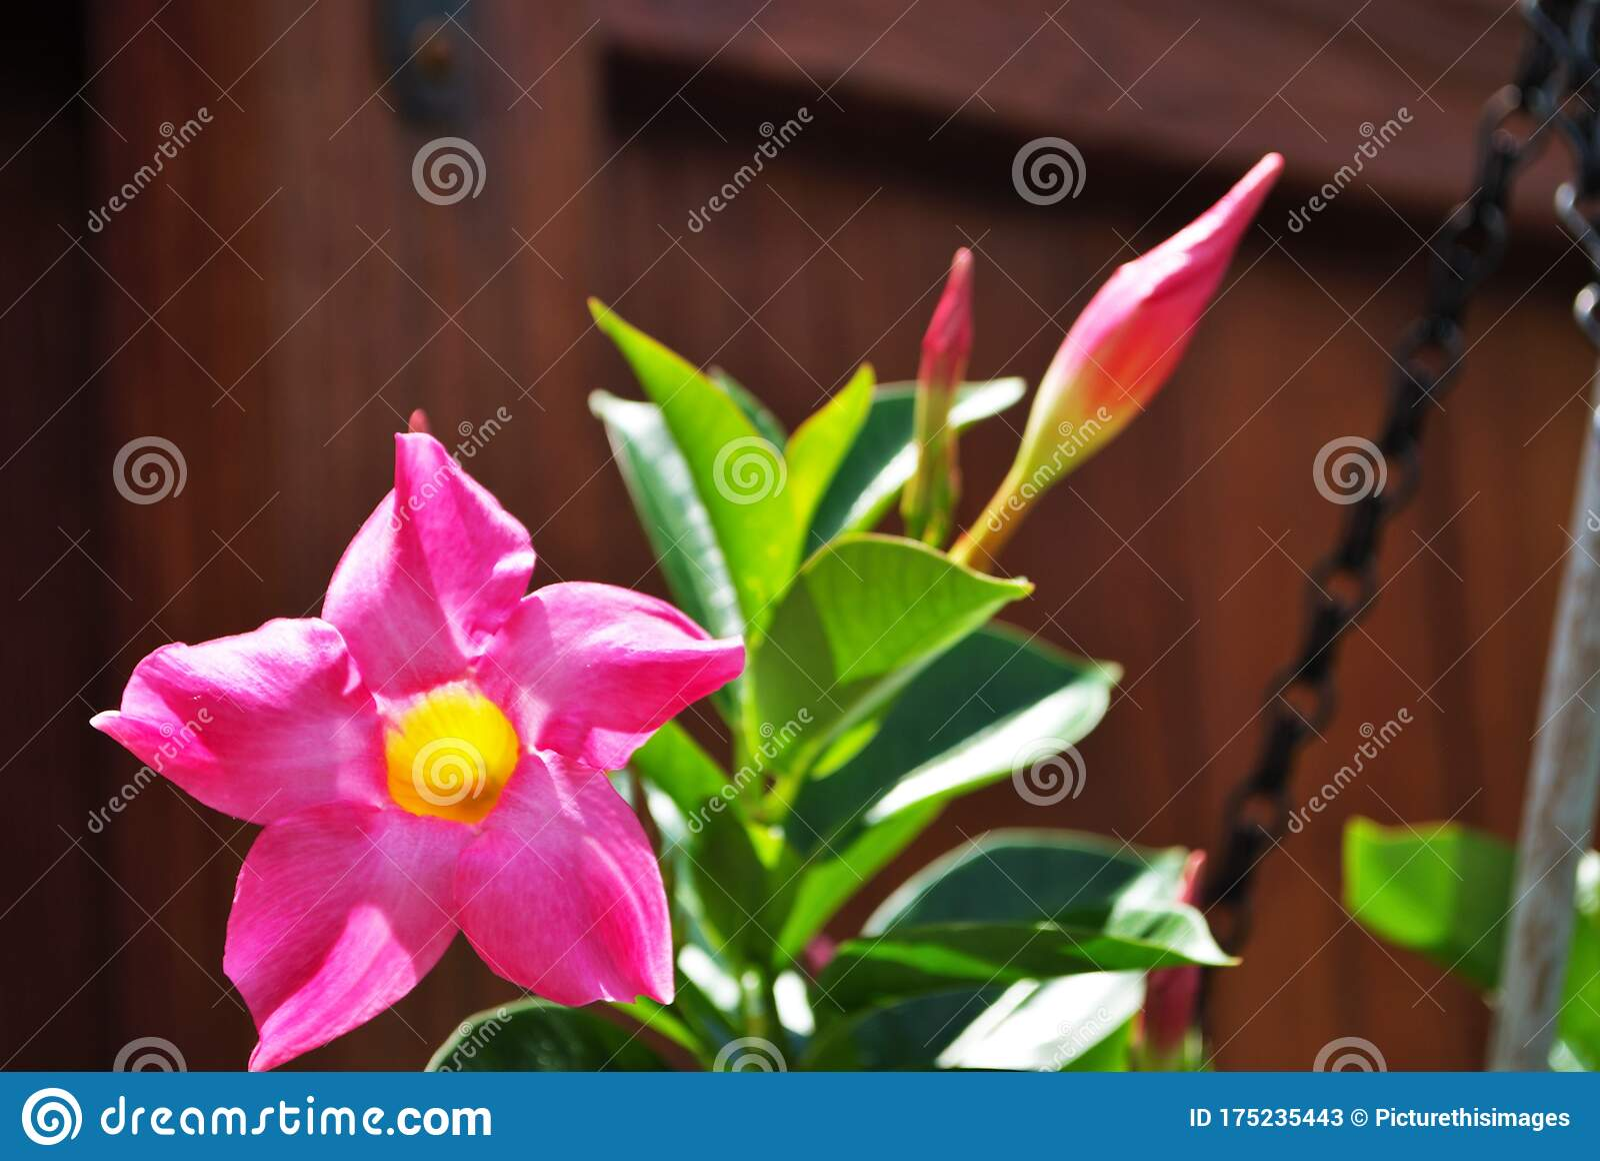 Rocktrumpet Mandevilla Plant Growing In My Front Yard Flower Bed Spring Time Stock Image Image Of Botanical Little 175235443